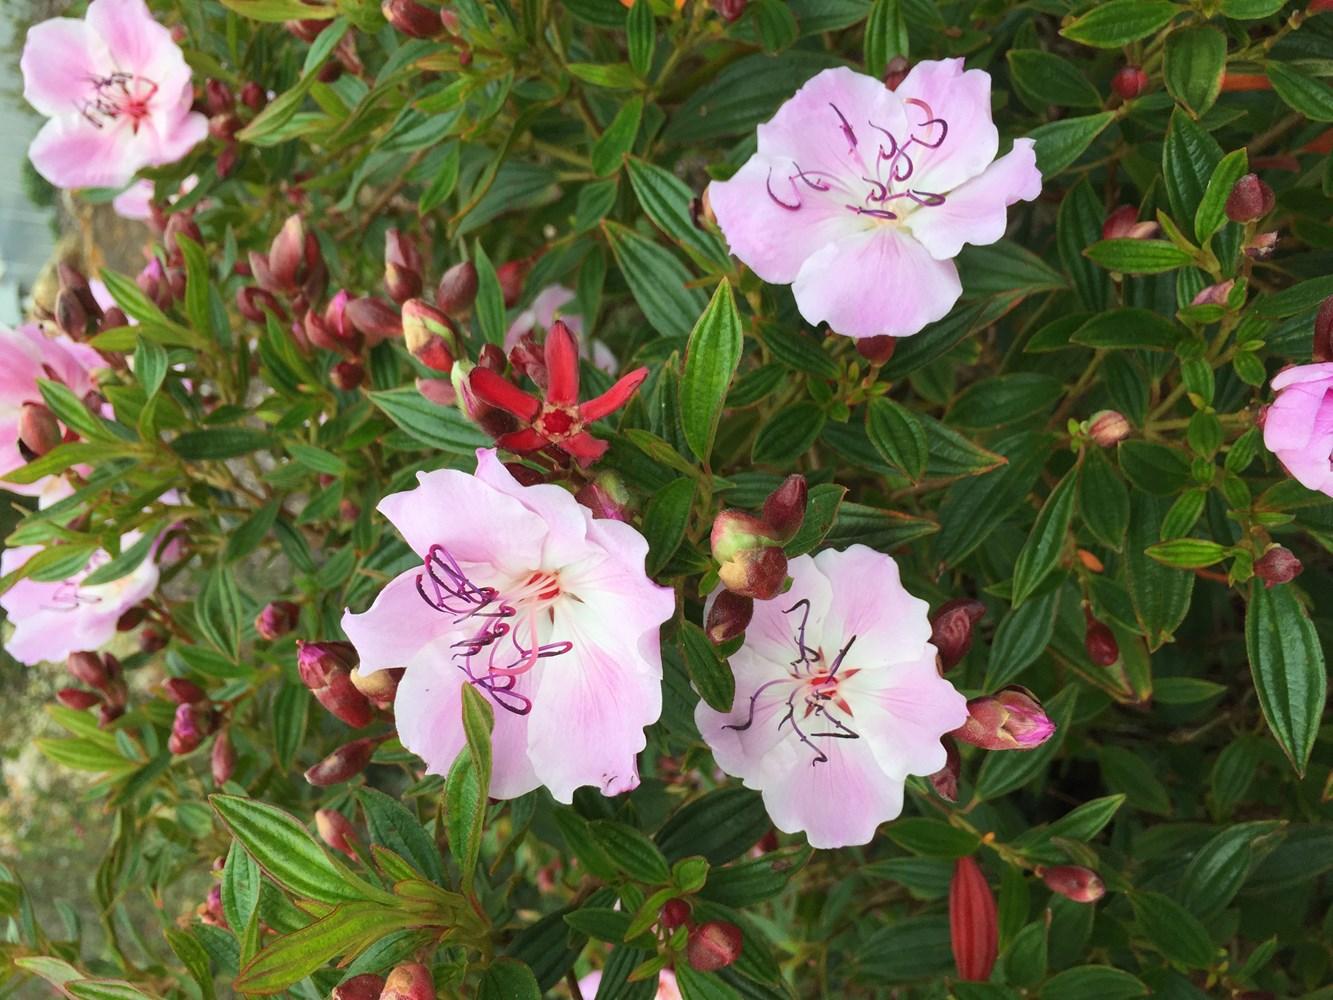 Website/Plants/1712310008/Images/Gallery/t_peach_04.0.jpg